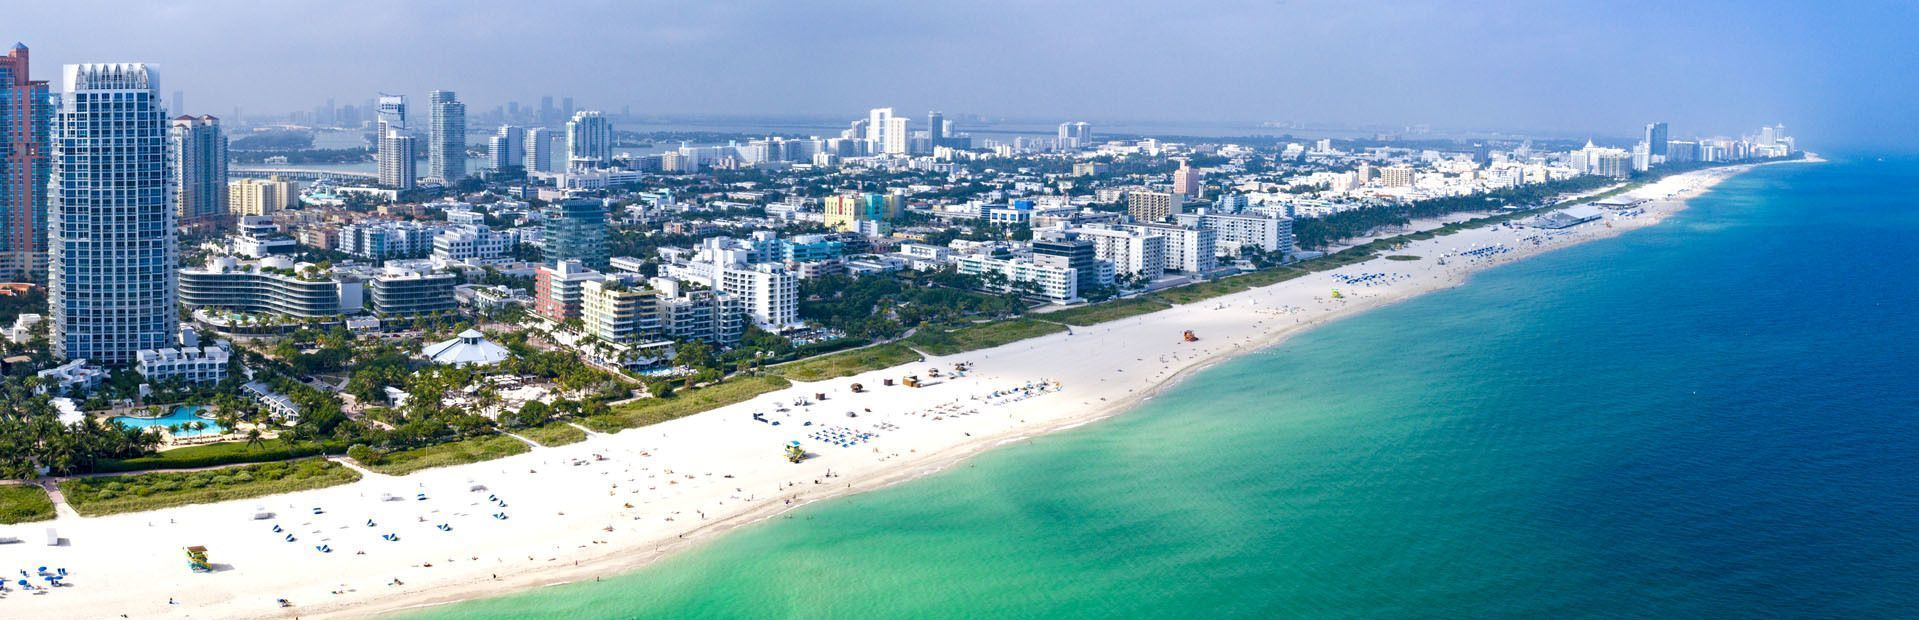 Florida 360°